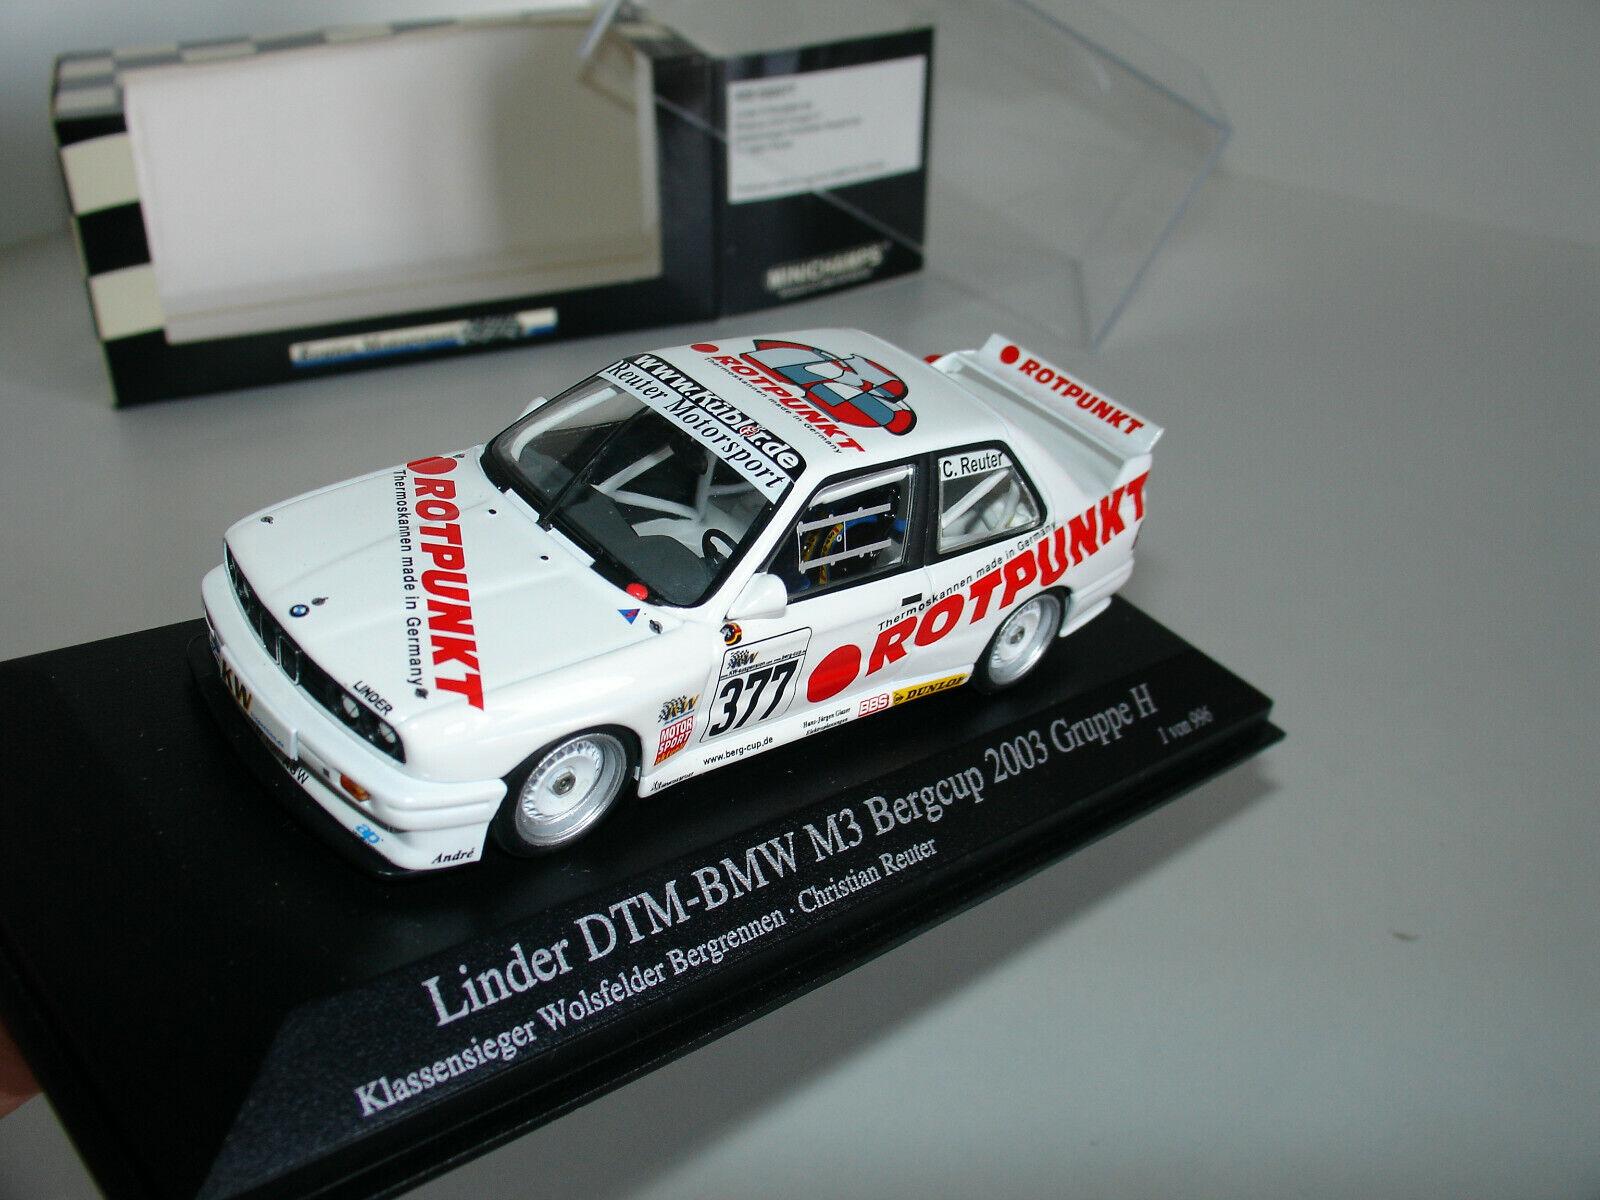 1 43 LINDER DTM-BMW M3 Bergcup 2003 Gruppe H  377  ROTPUNKT  L.E 996 MINICHAMPS